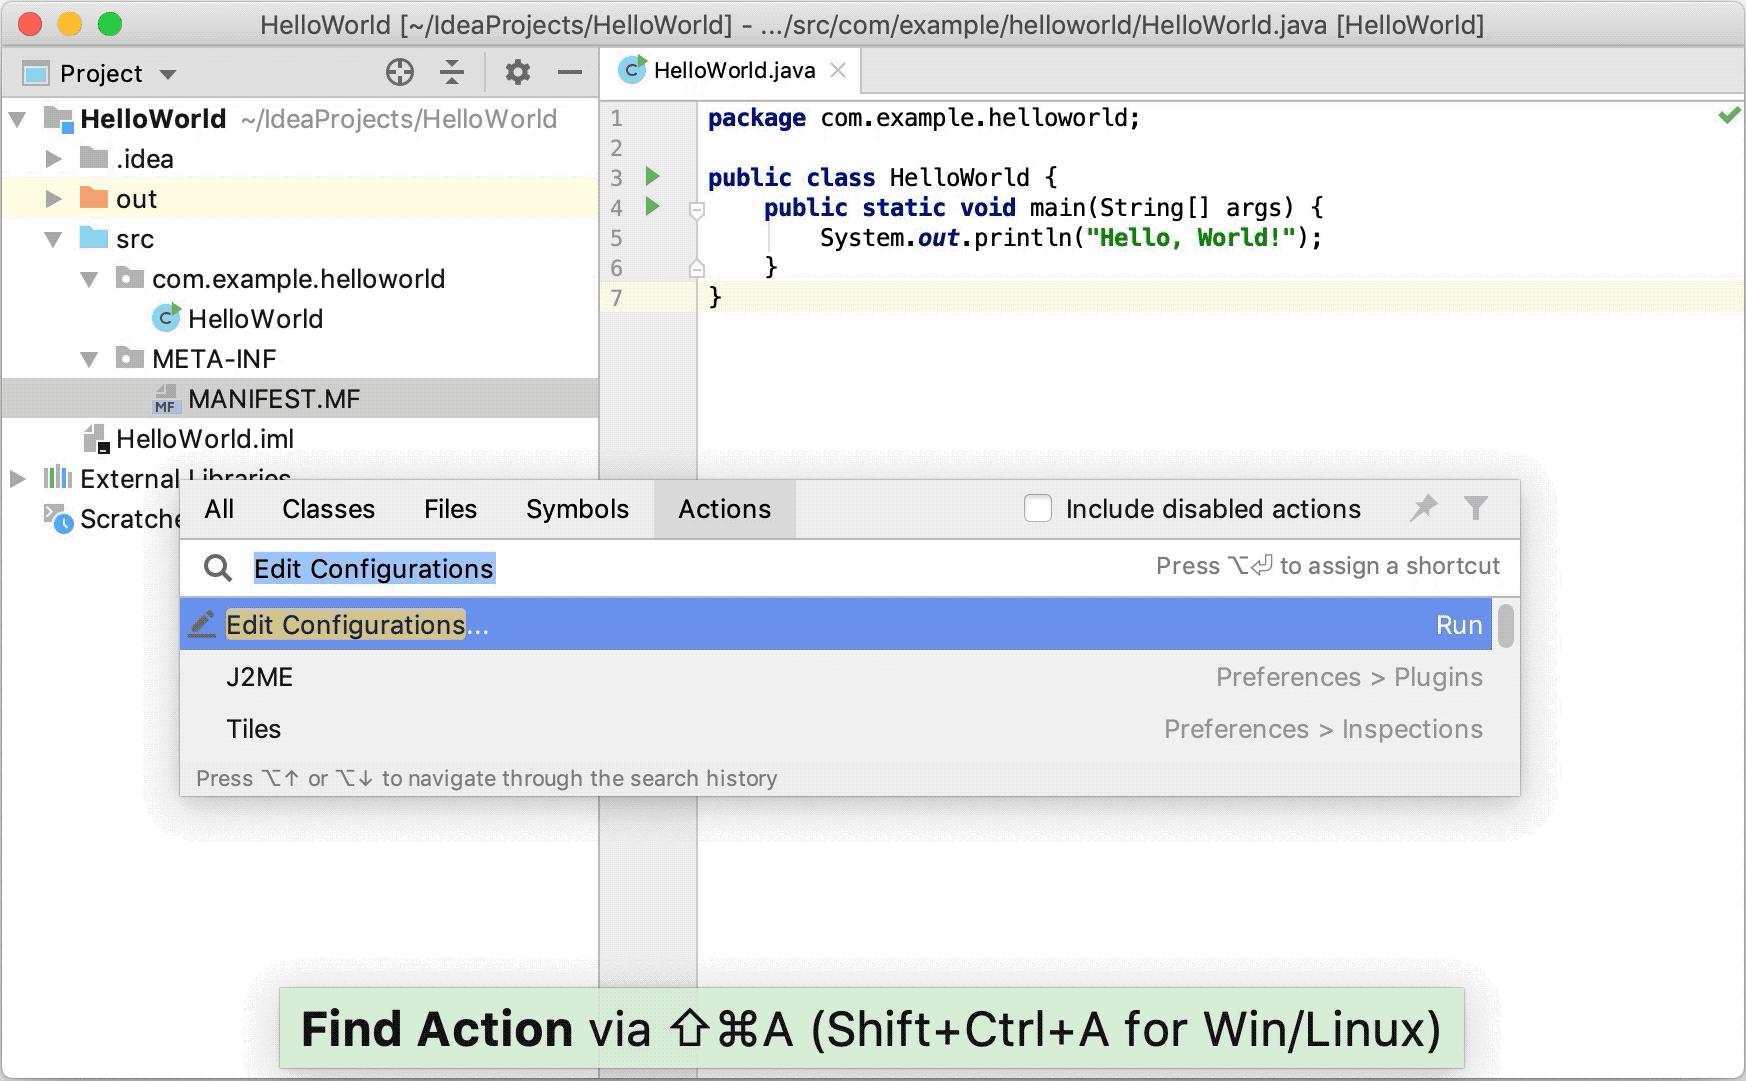 Creating a new run configuration